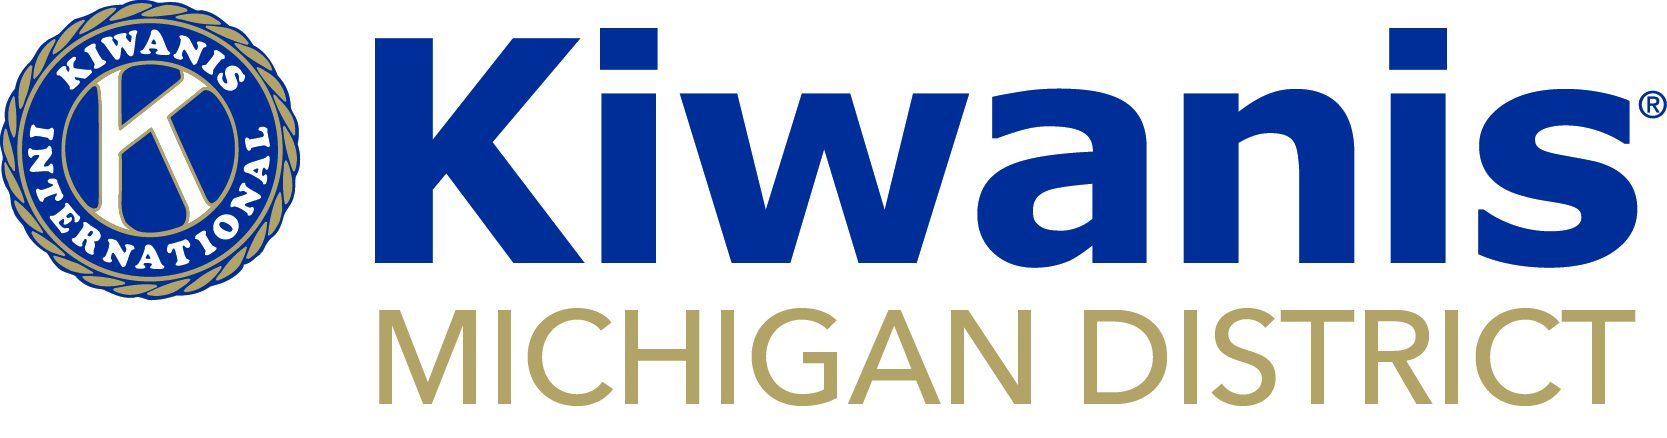 Kiwanis District of Michigan